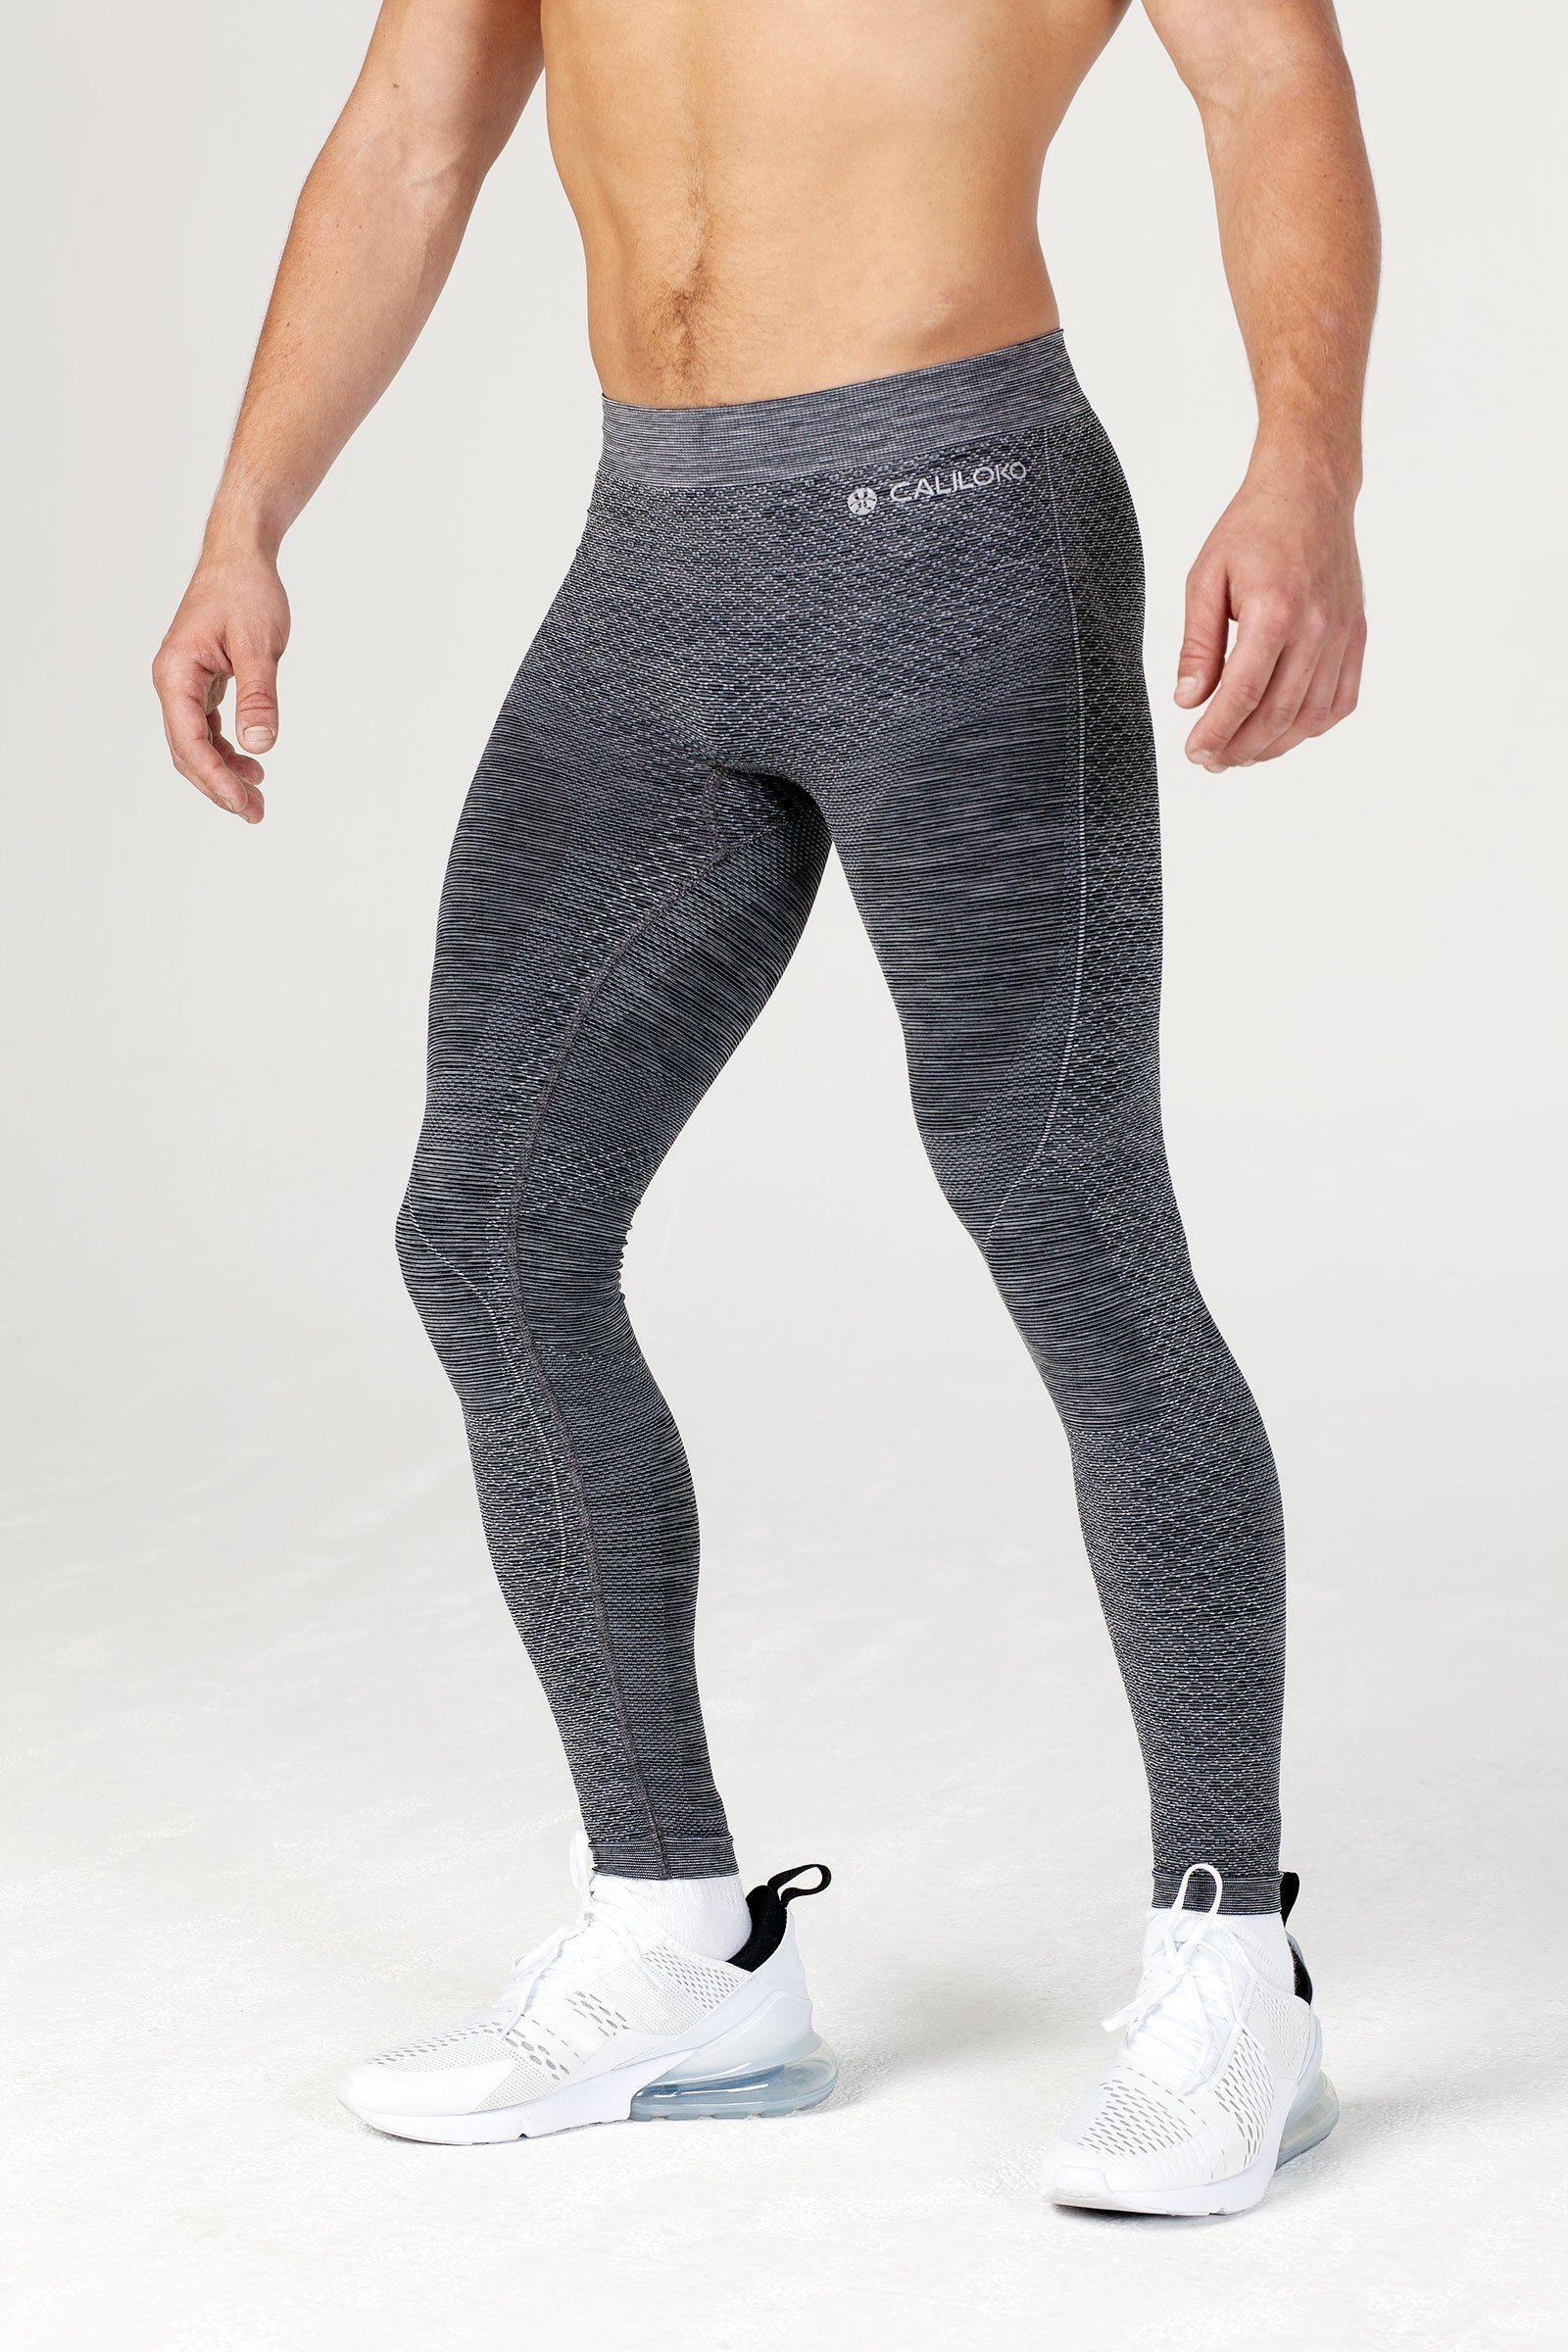 Fashion Men Sport Fitness Running Compression Stretch Leggings Pants